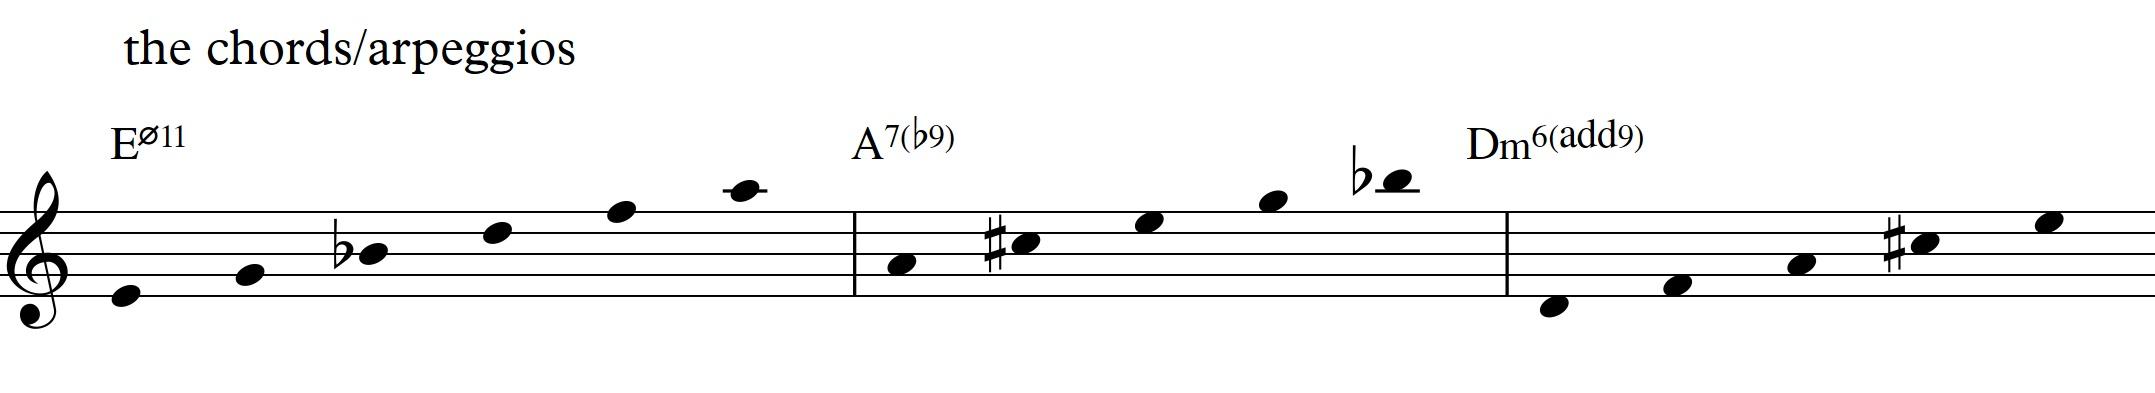 Diatonic approach 6 minor ii v i 7th chords sren ballegaard diatonic approach 6 minor ii v i diatonic 7th chords arpeggios hexwebz Choice Image